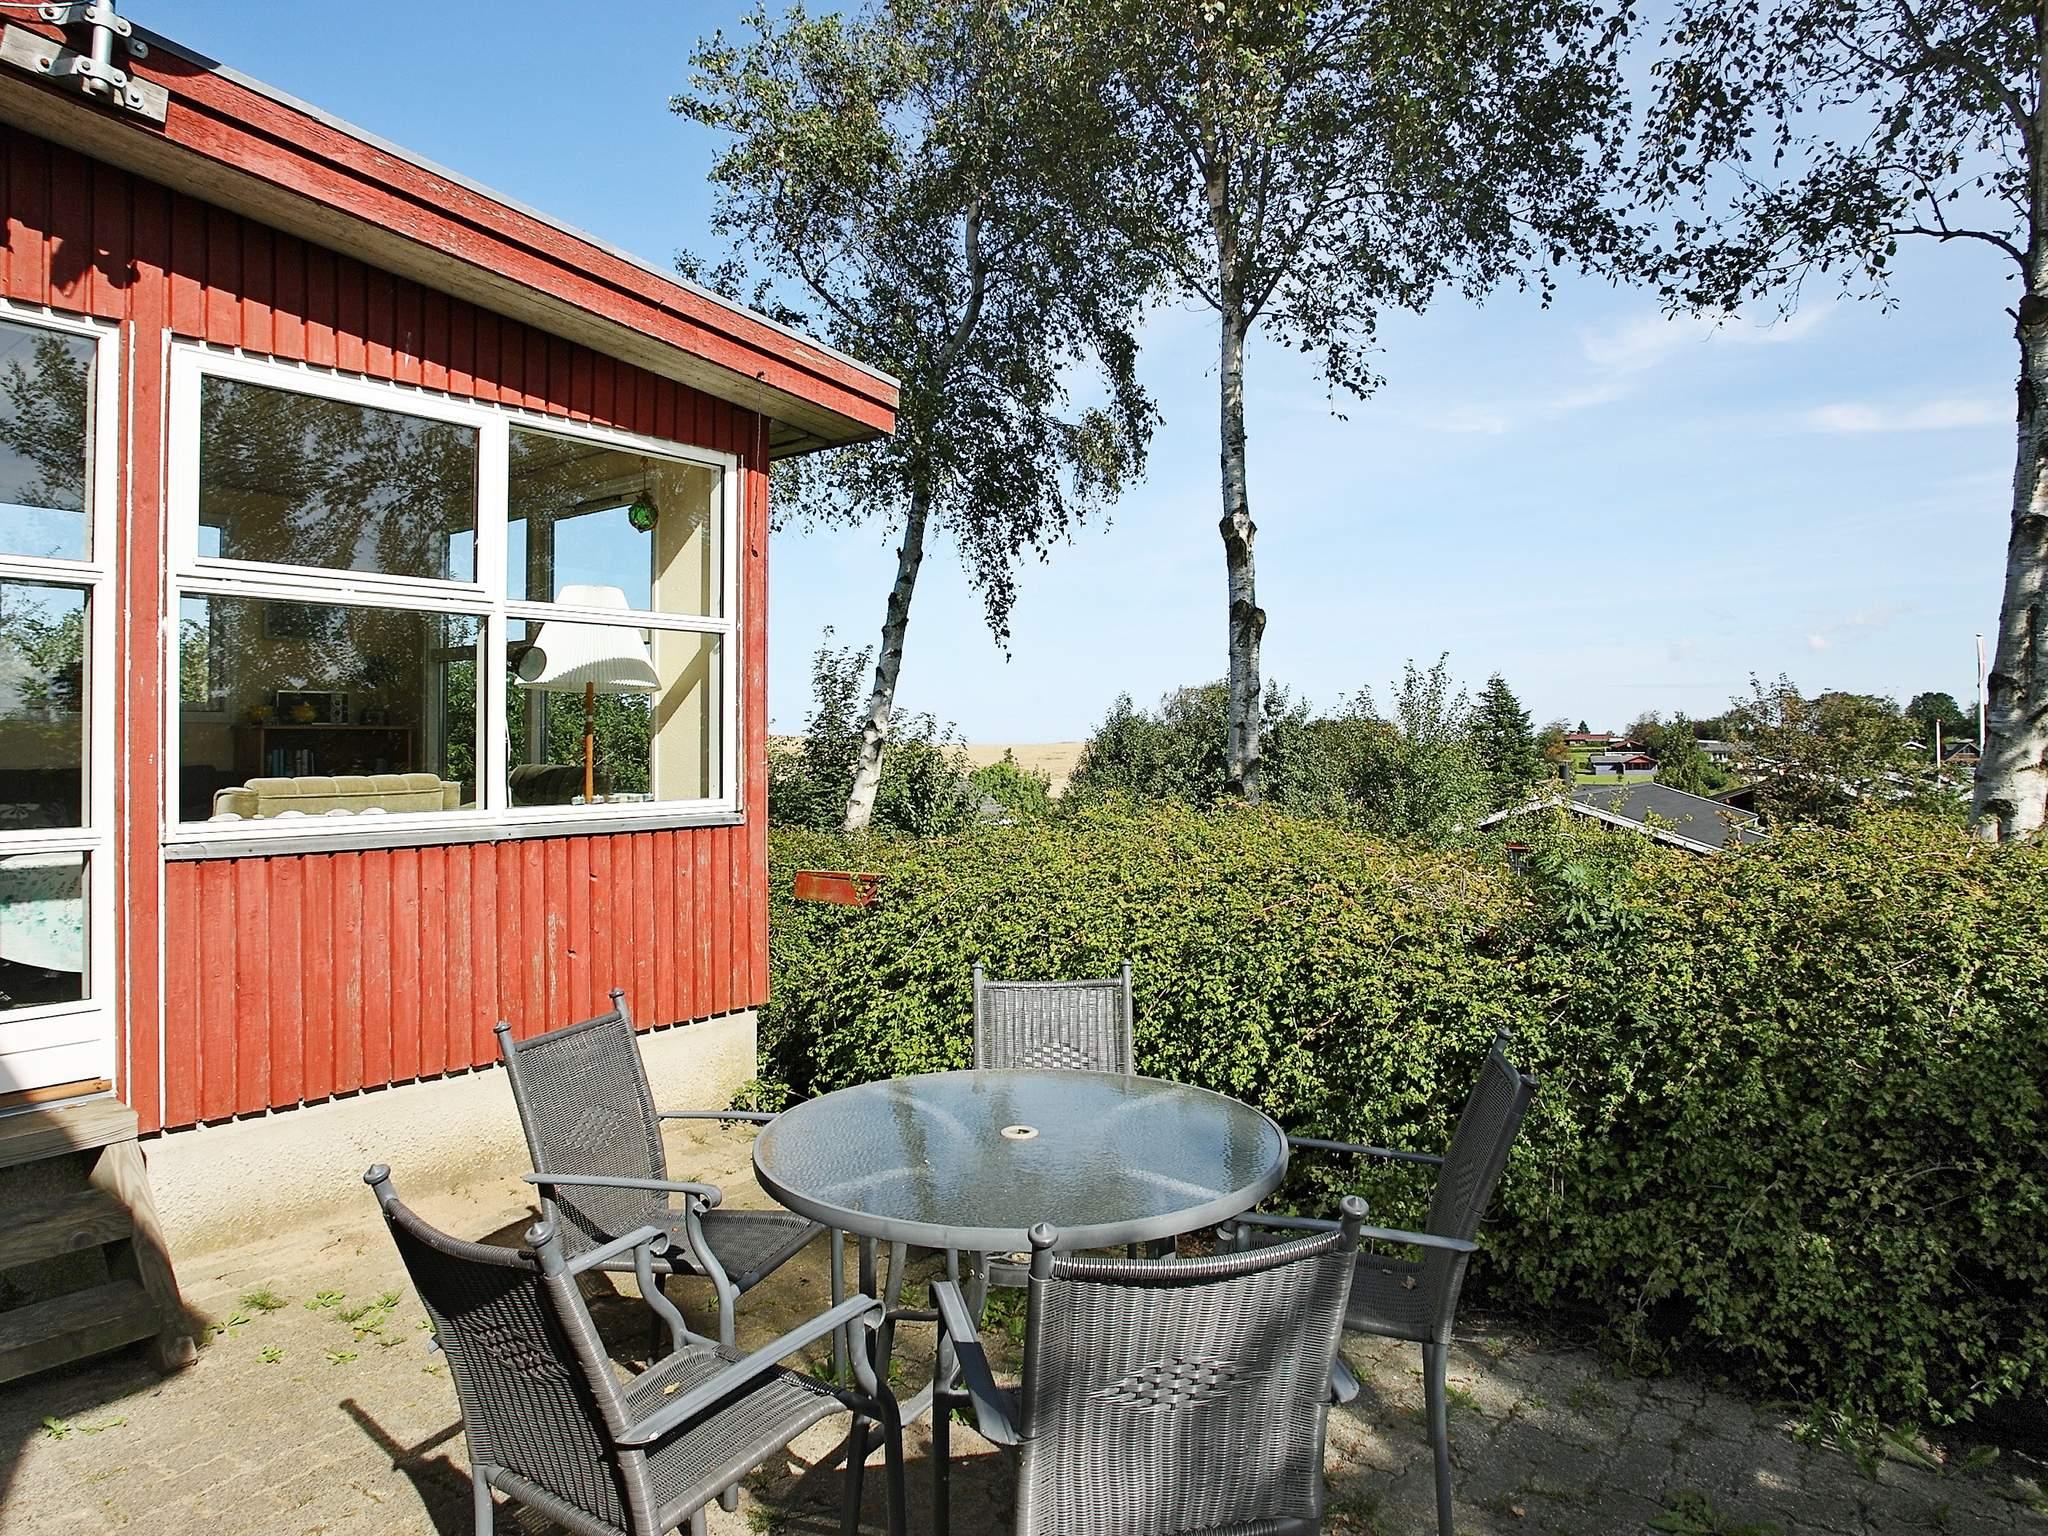 Ferienhaus Eskov Strandpark (83023), Roslev, , Limfjord, Dänemark, Bild 21